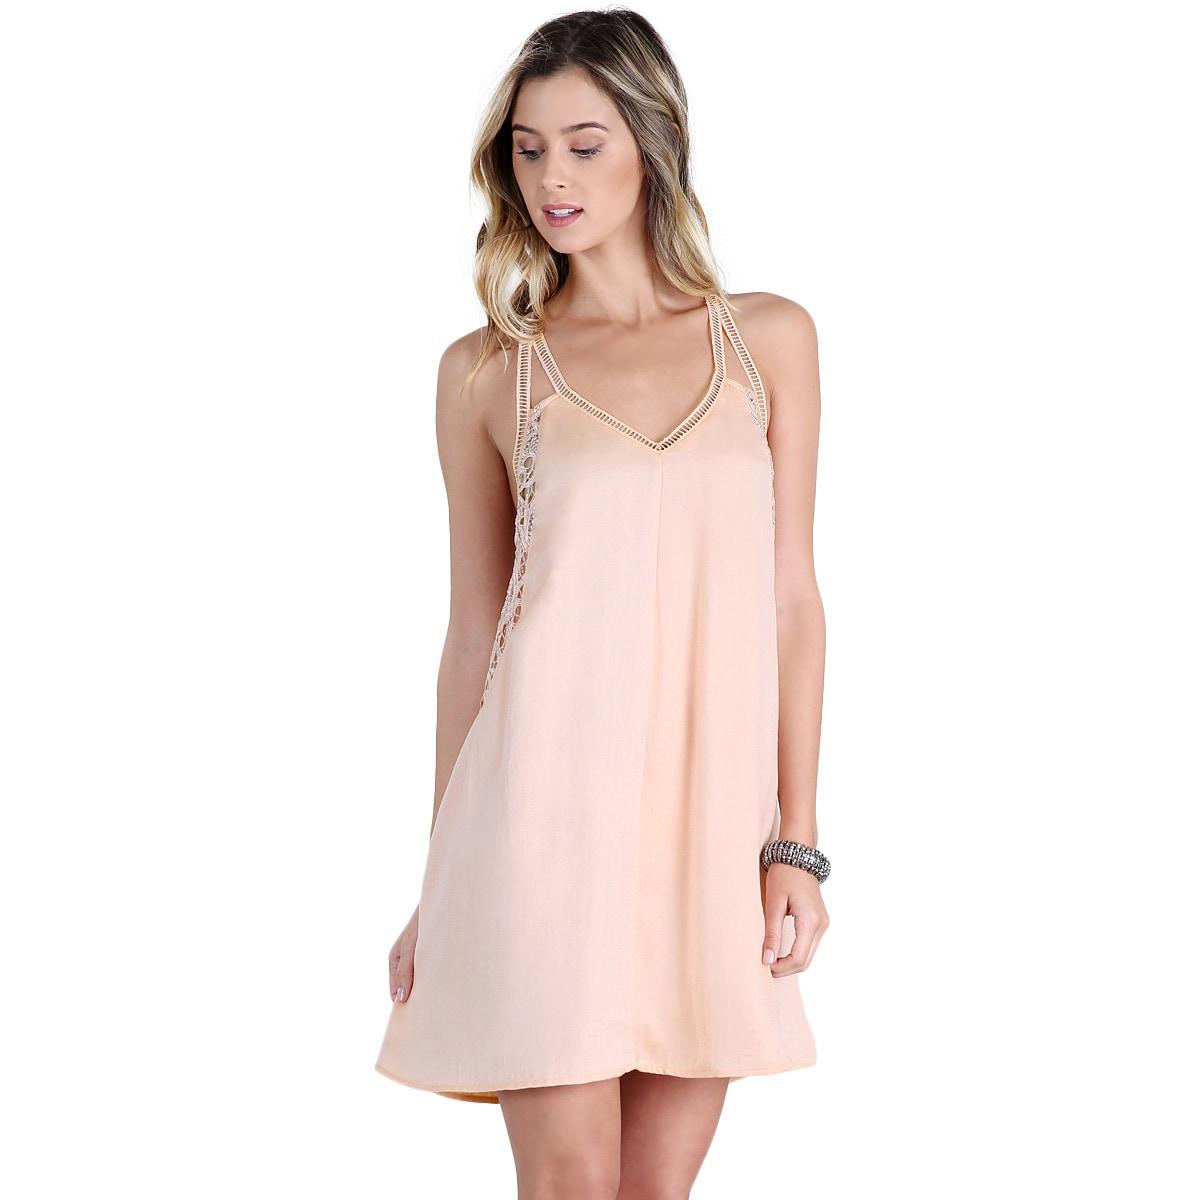 Shop Nikibiki Women\'s Sand/Beige Satin Lace-insert Slip Dress - Free ...